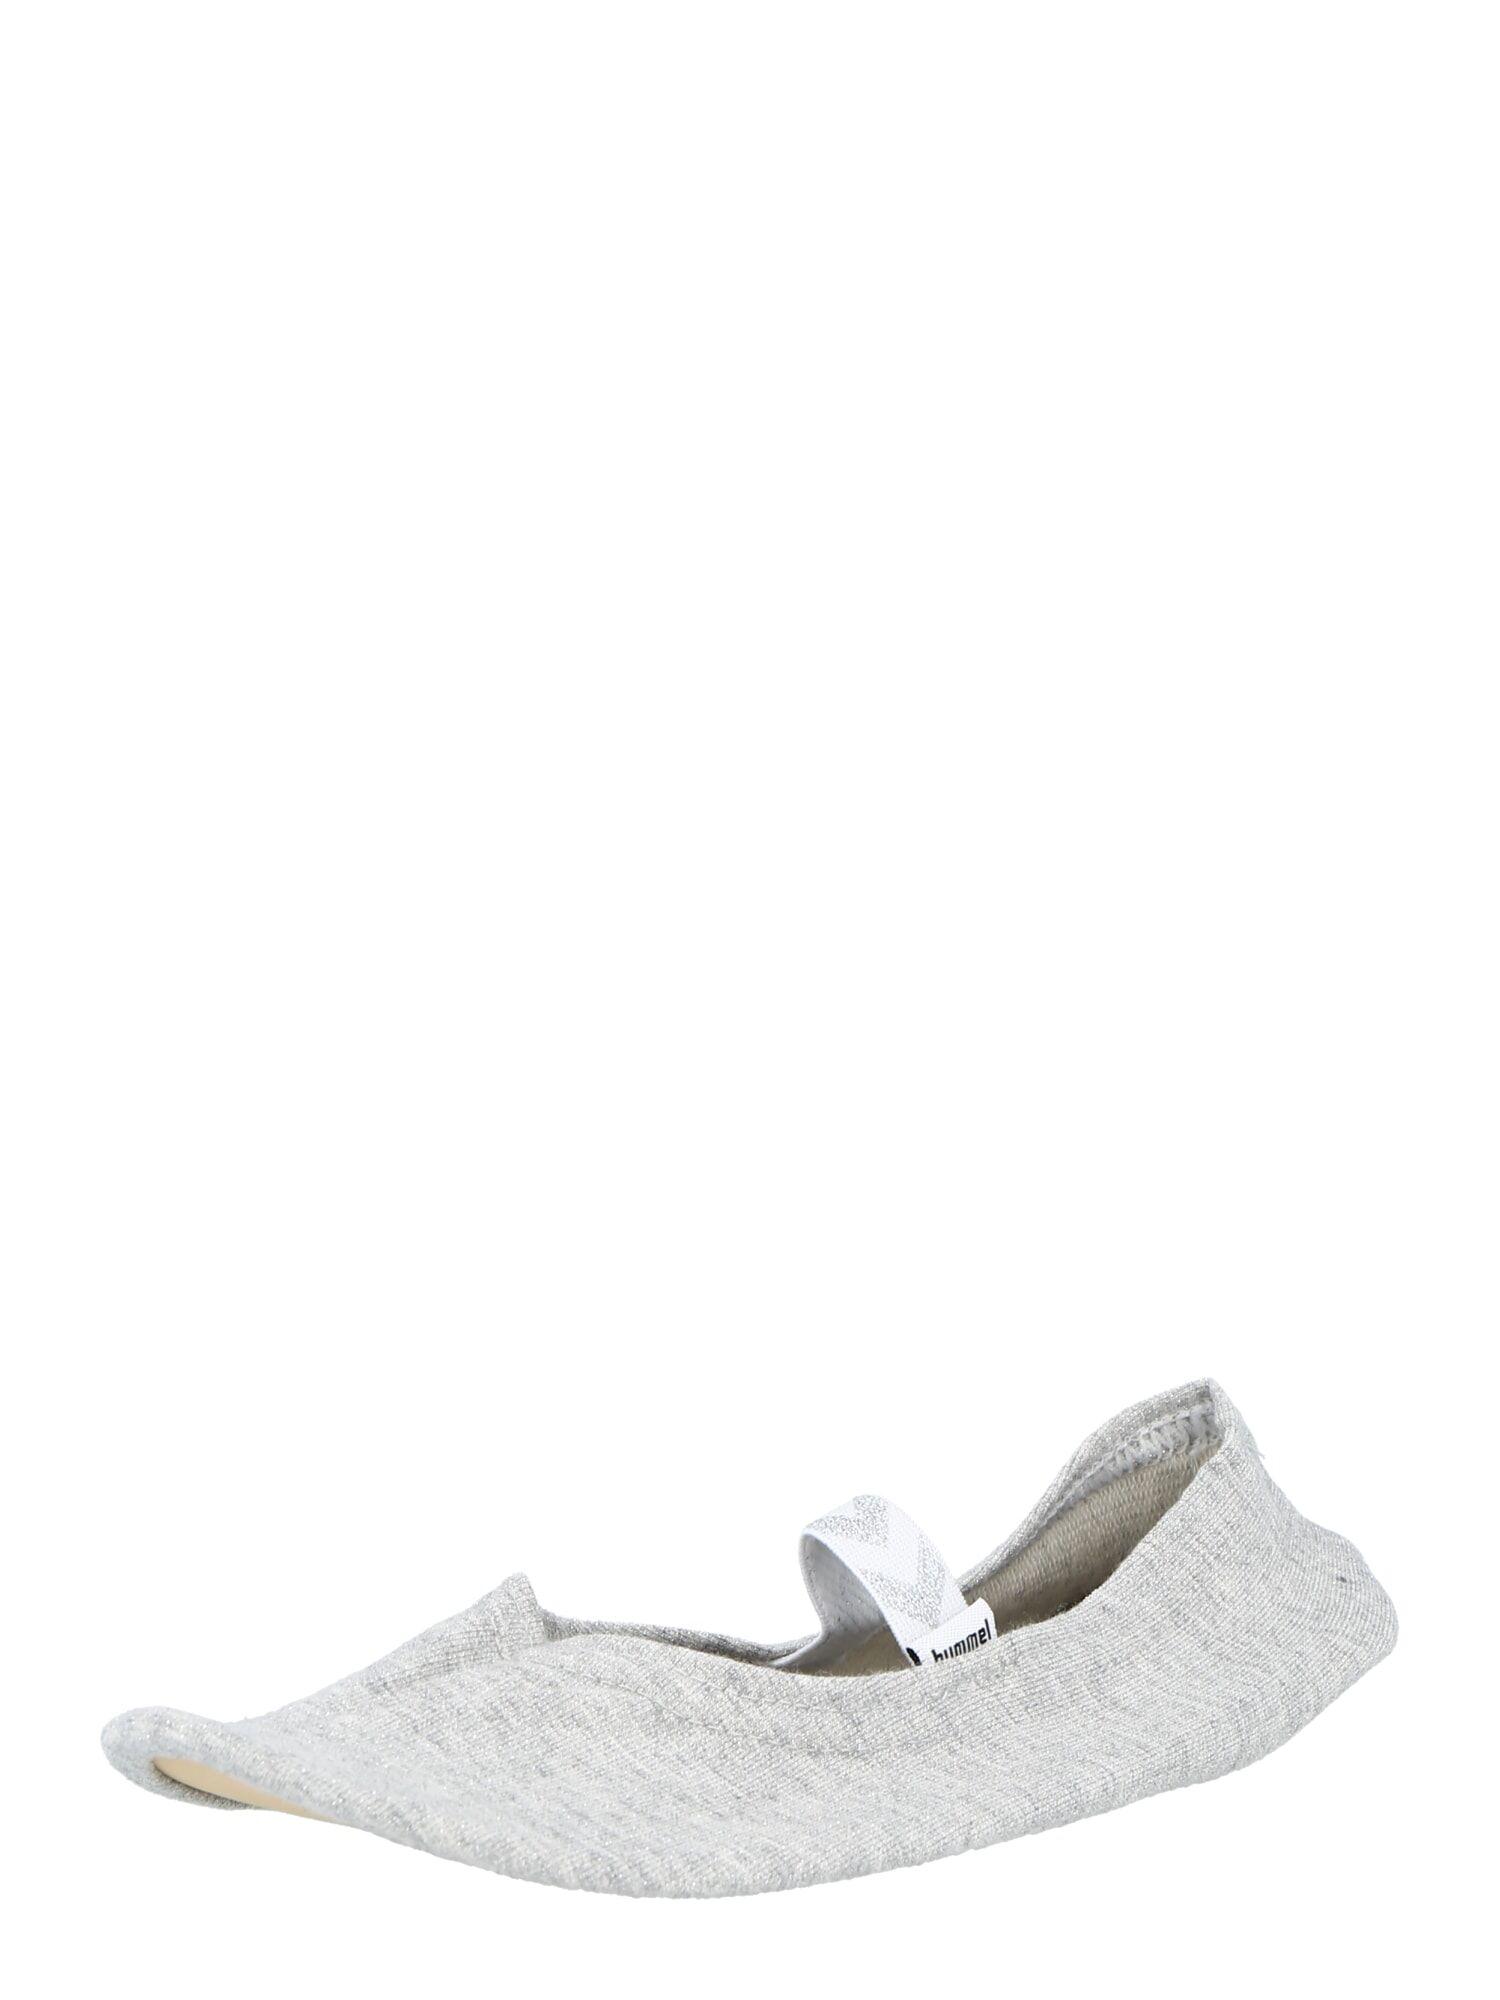 Hummel Chaussure de sport  - Gris - Taille: 40 - boy